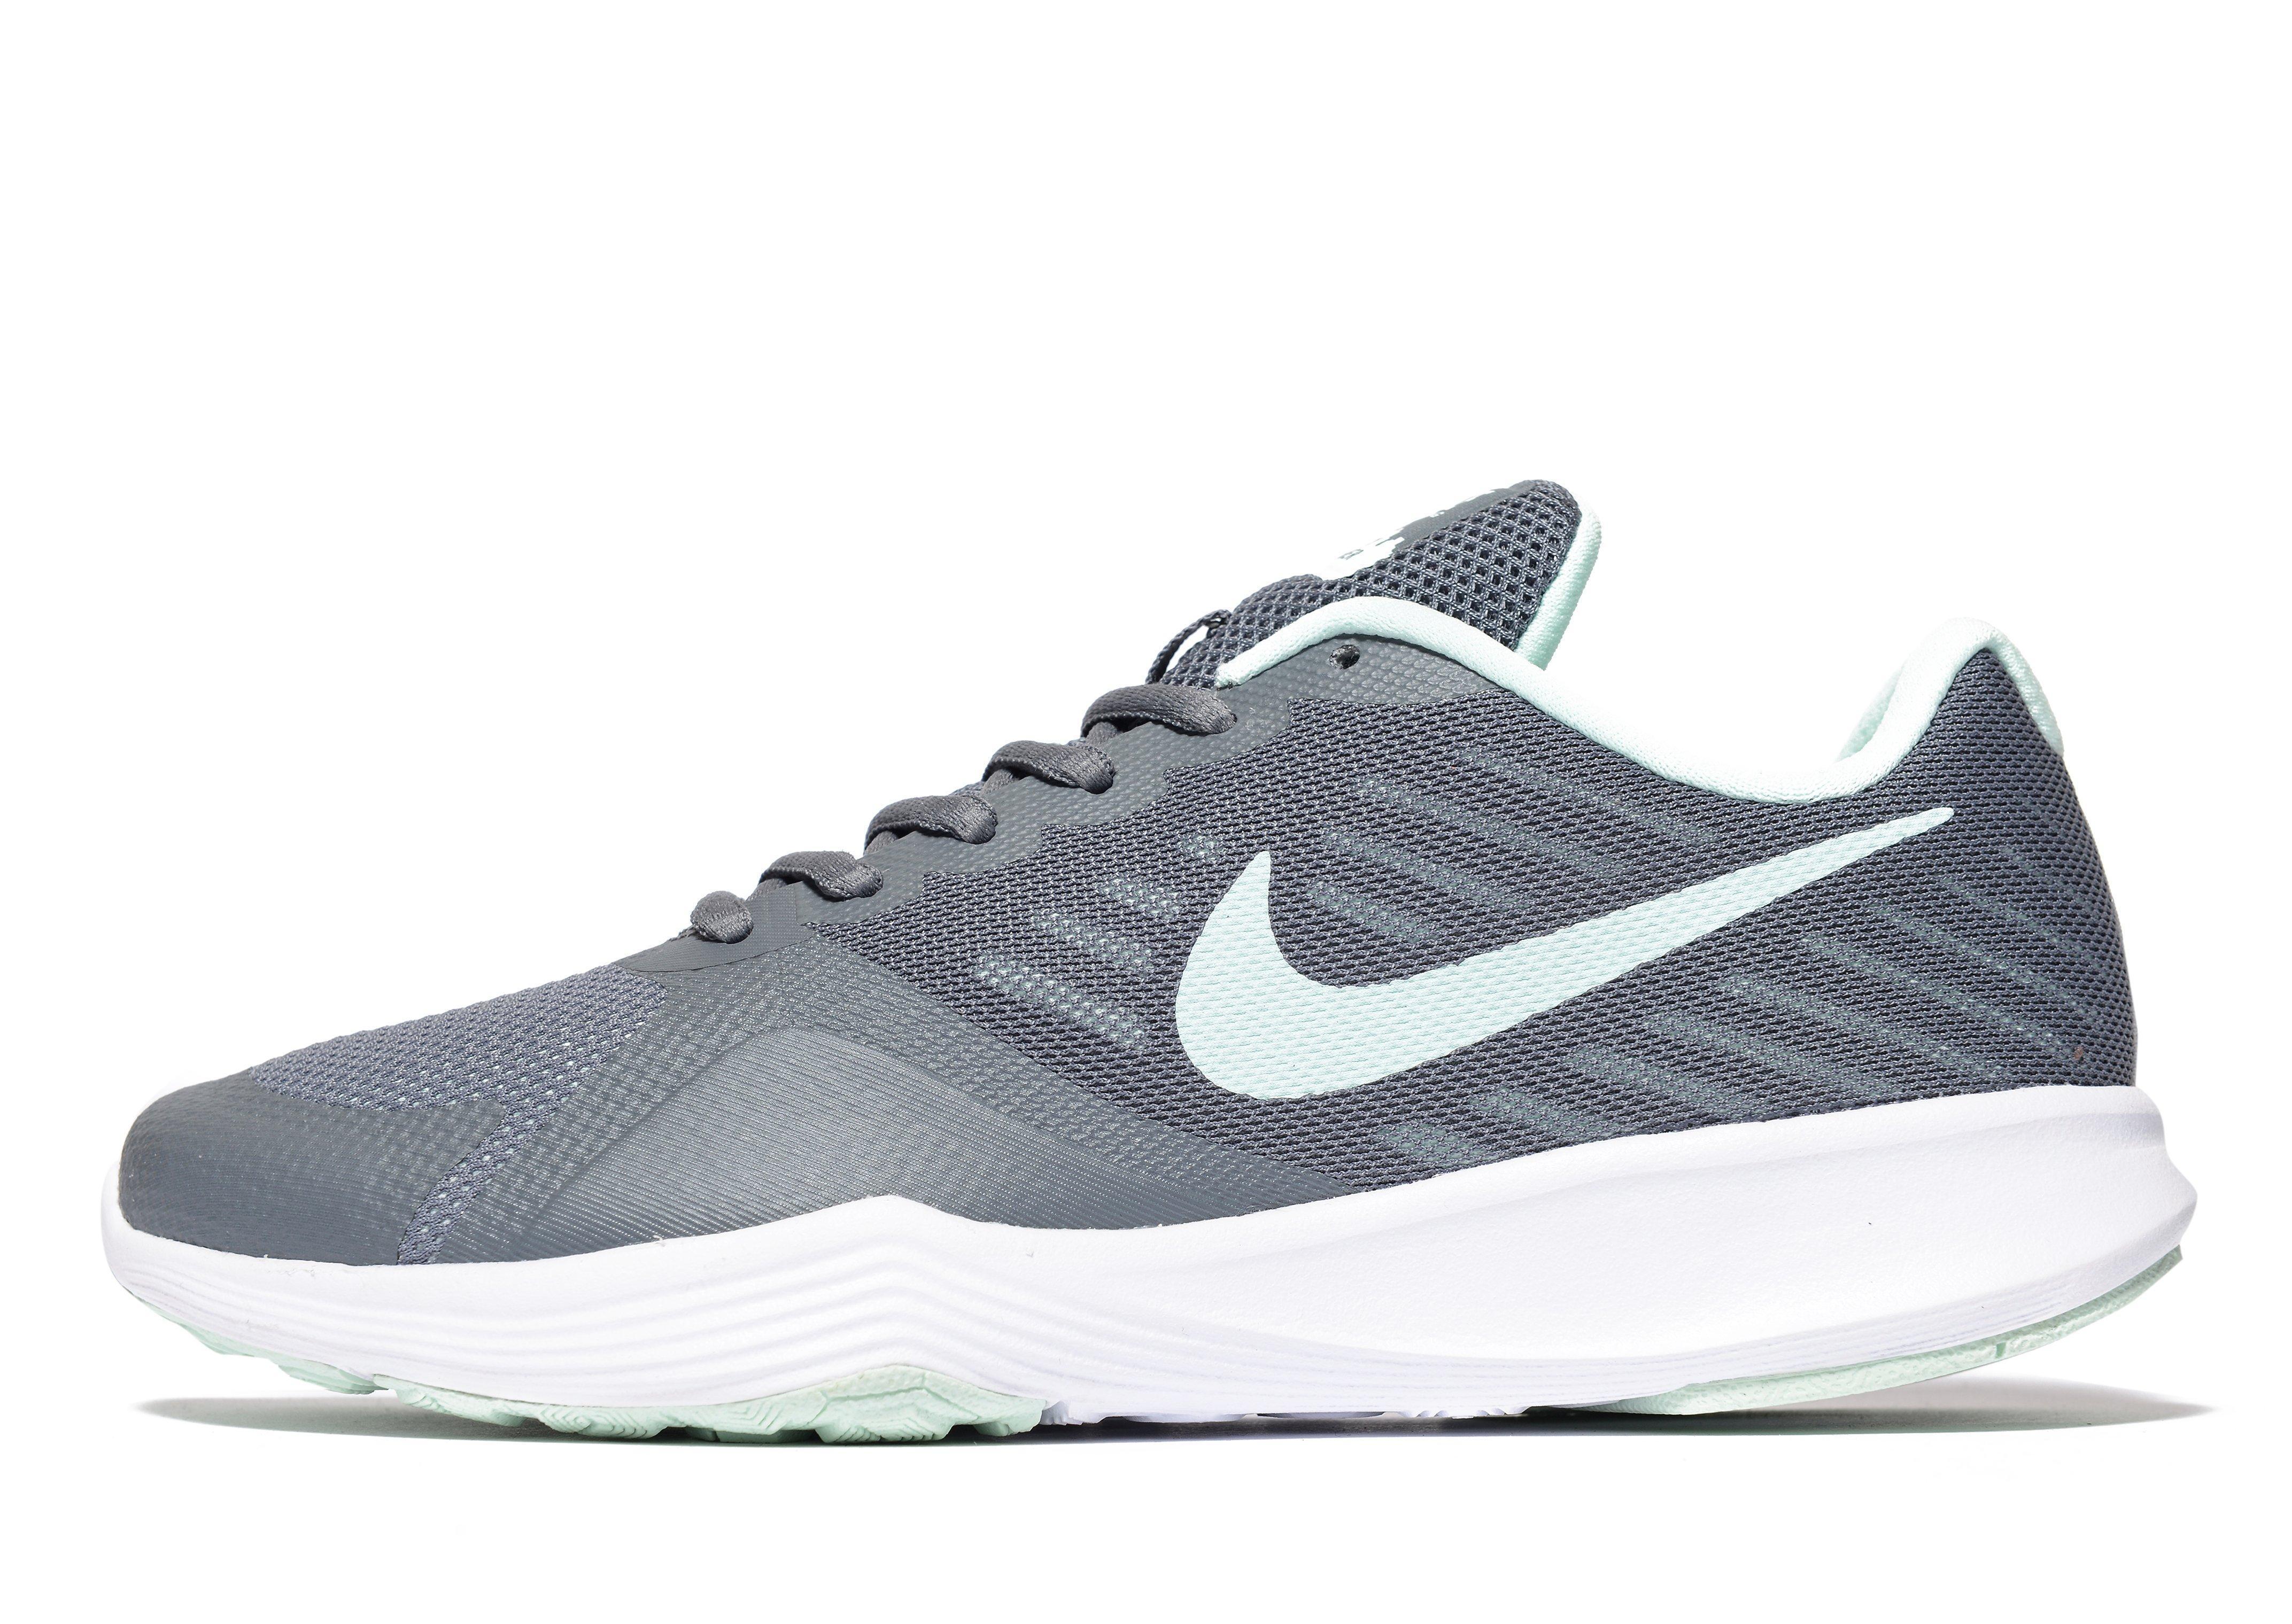 5fc47445cb9 Lyst - Nike City Trainer